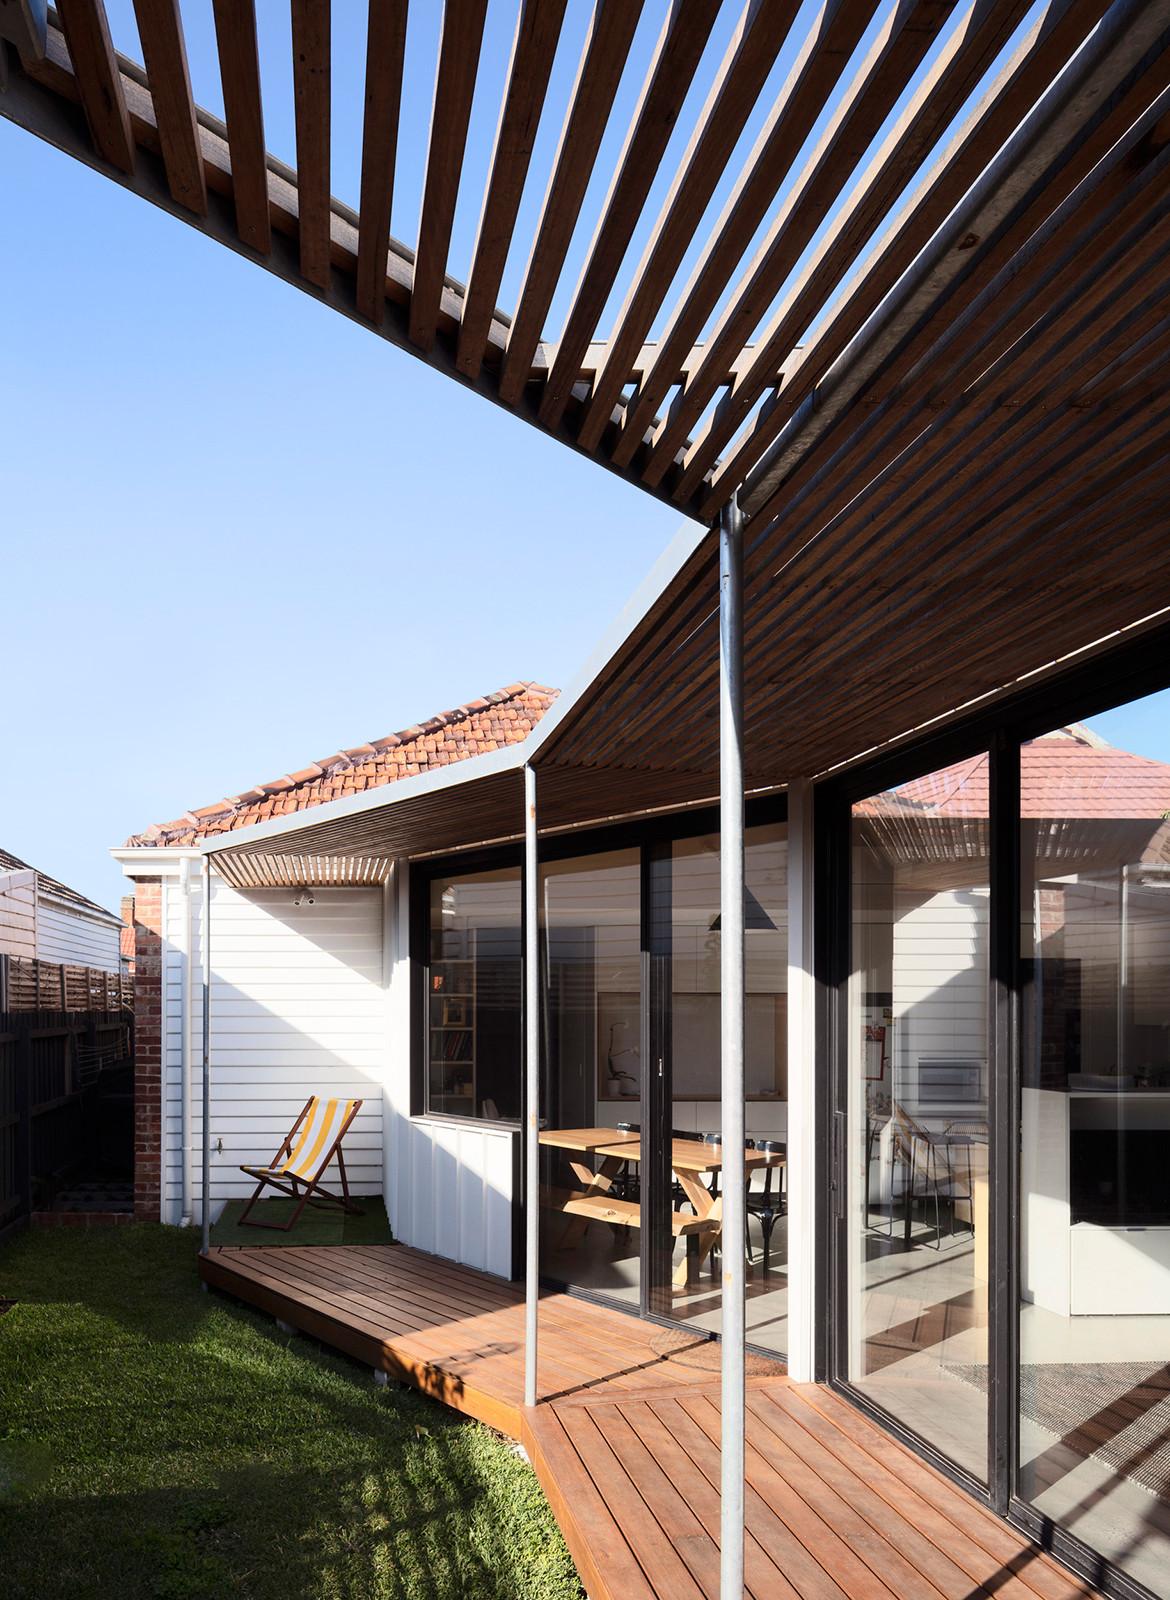 Allan Street House Gardiner Architects CC Rory Gardiner entrance